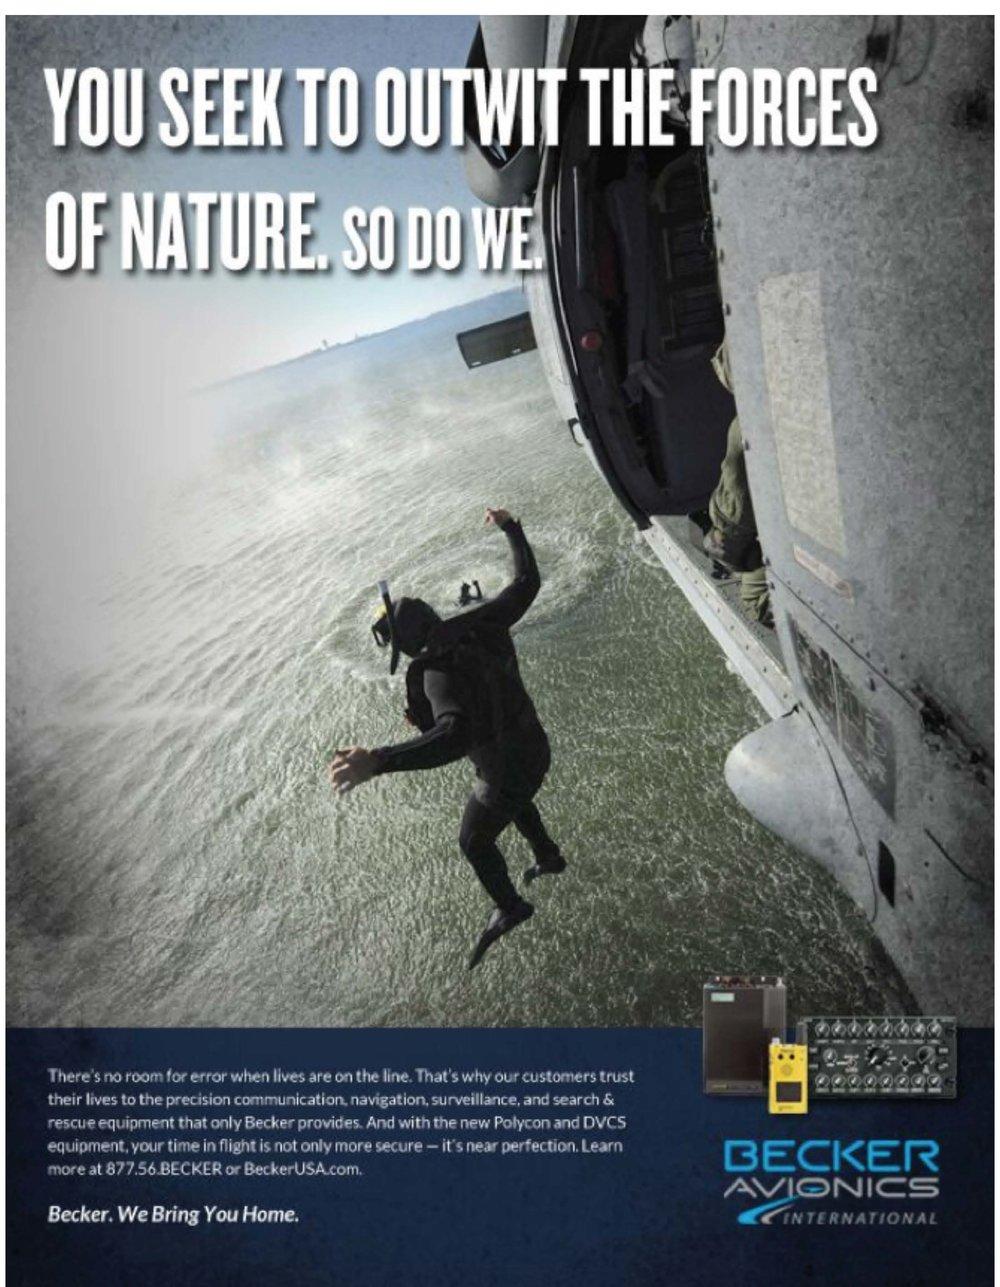 Becker Print Ad Campaign